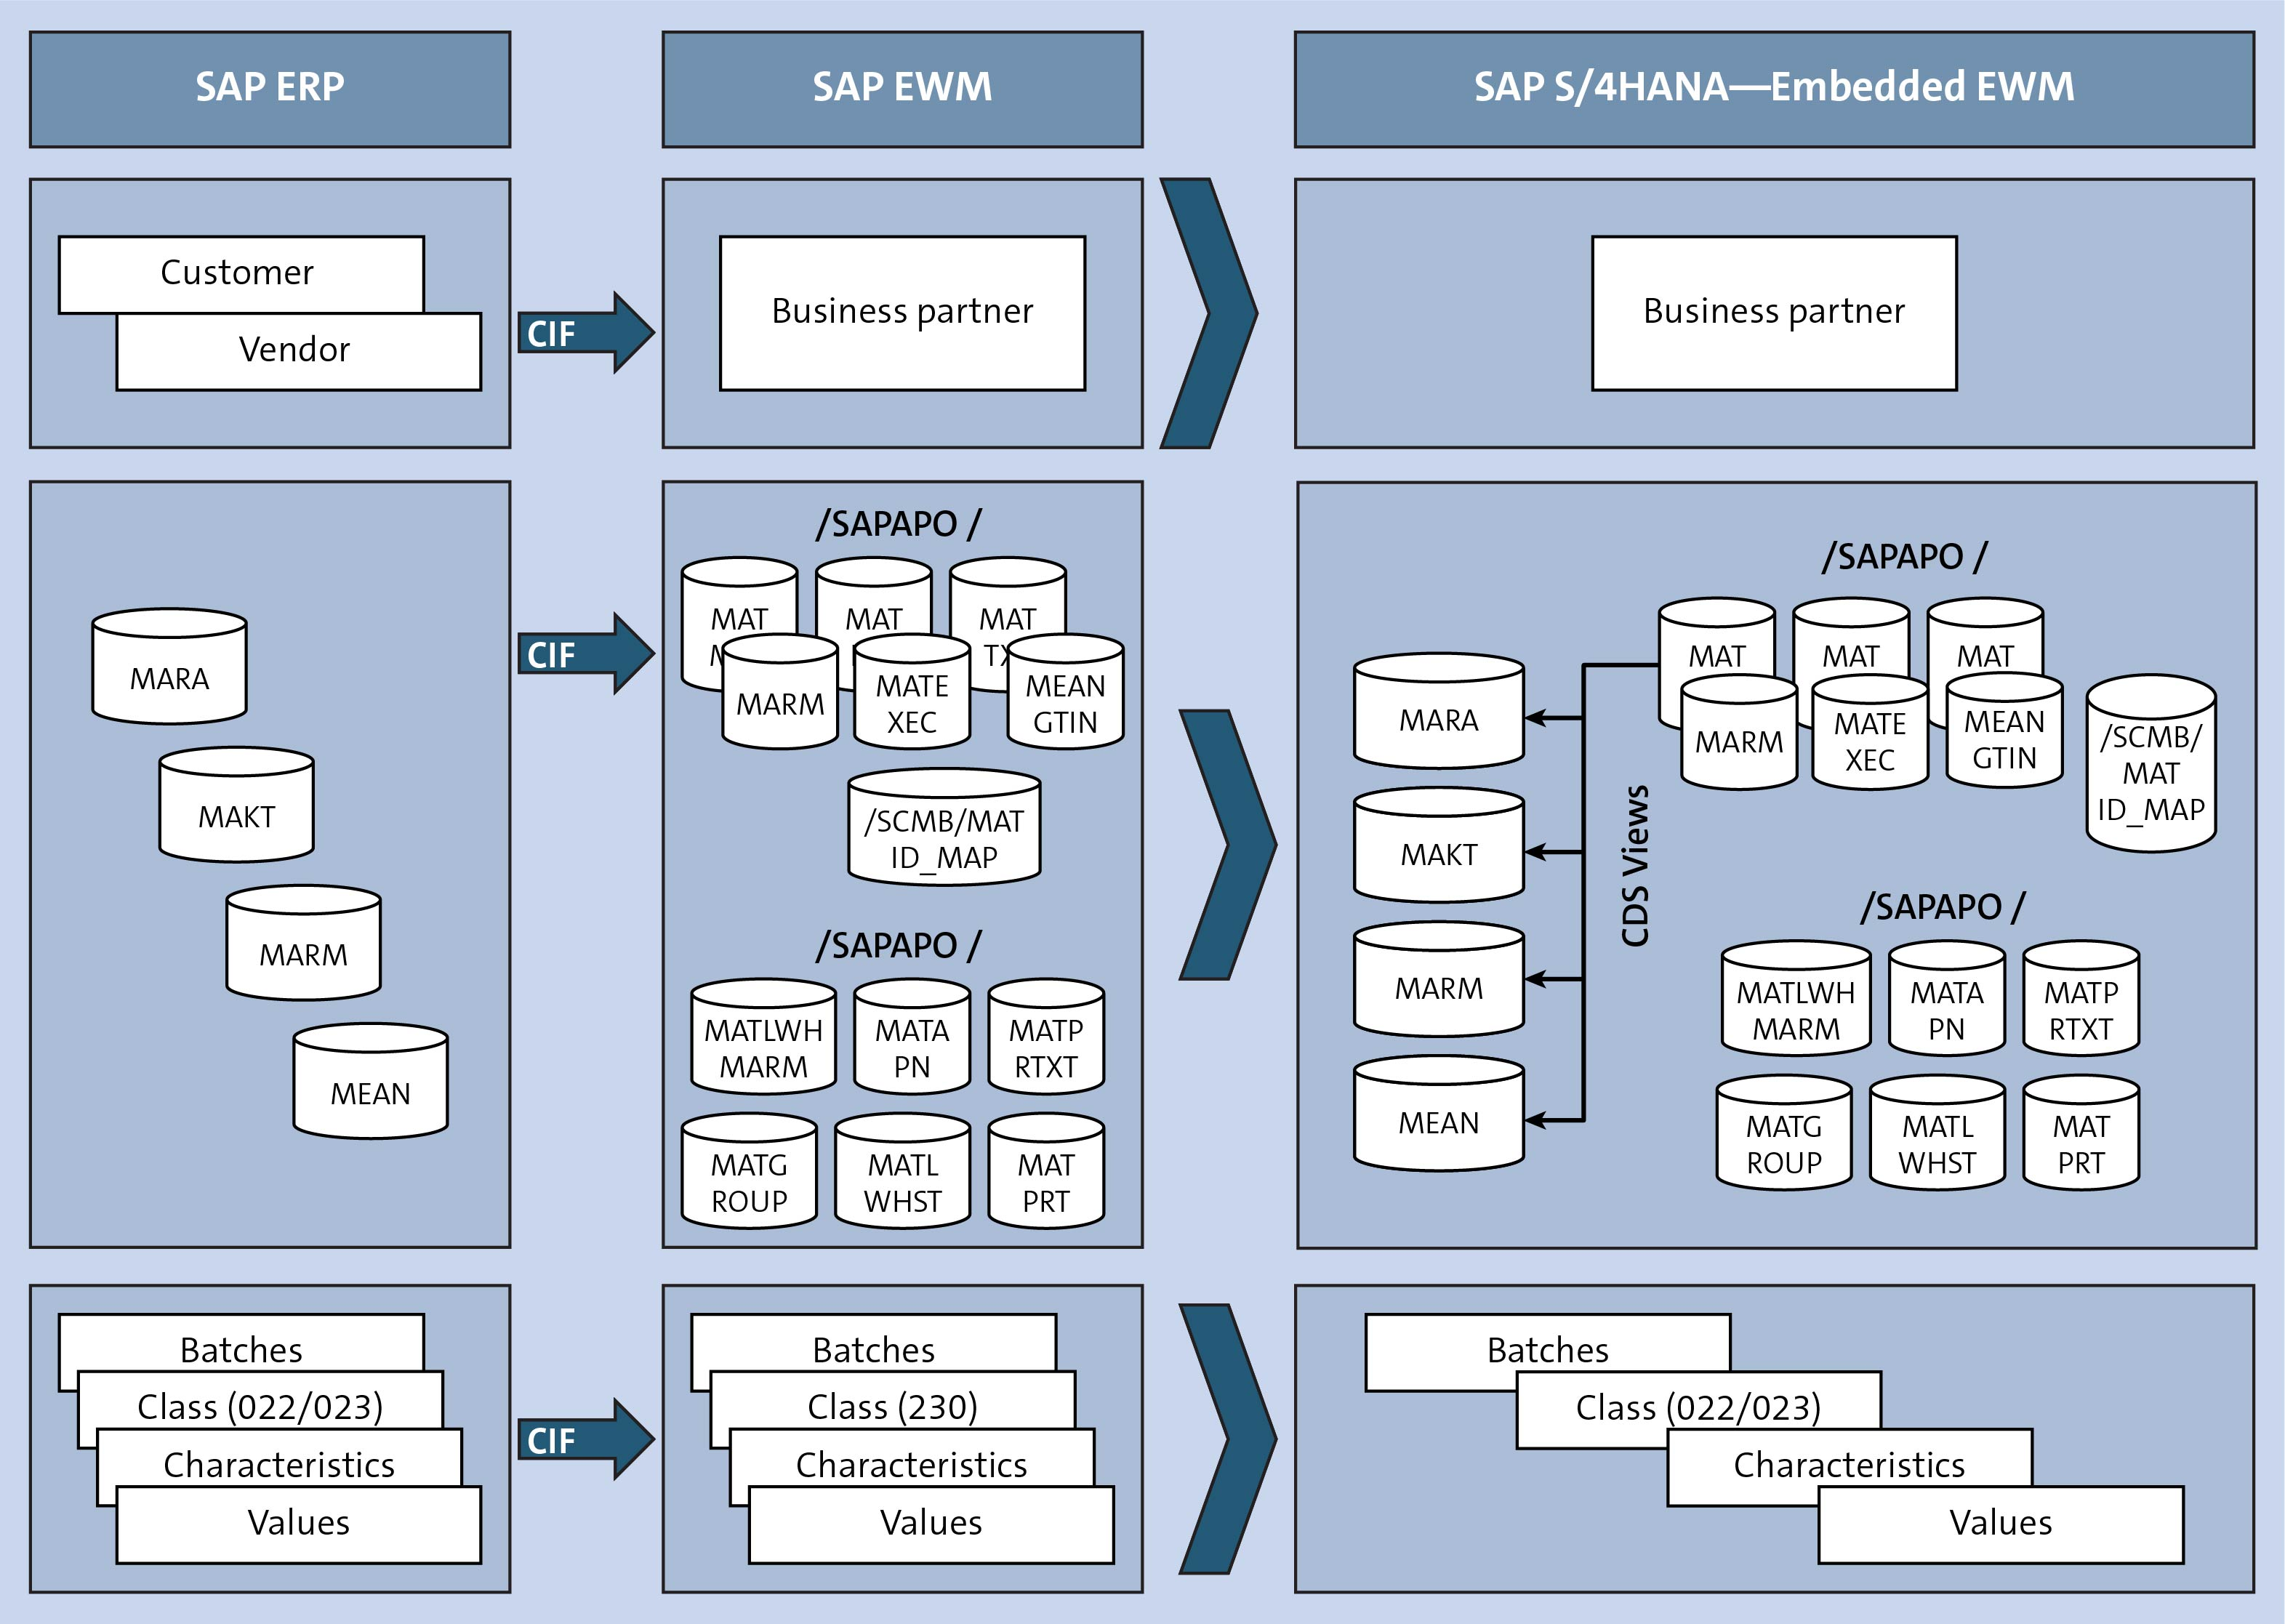 Data Extraction Methods SAP ERP to SAP S/4HANA